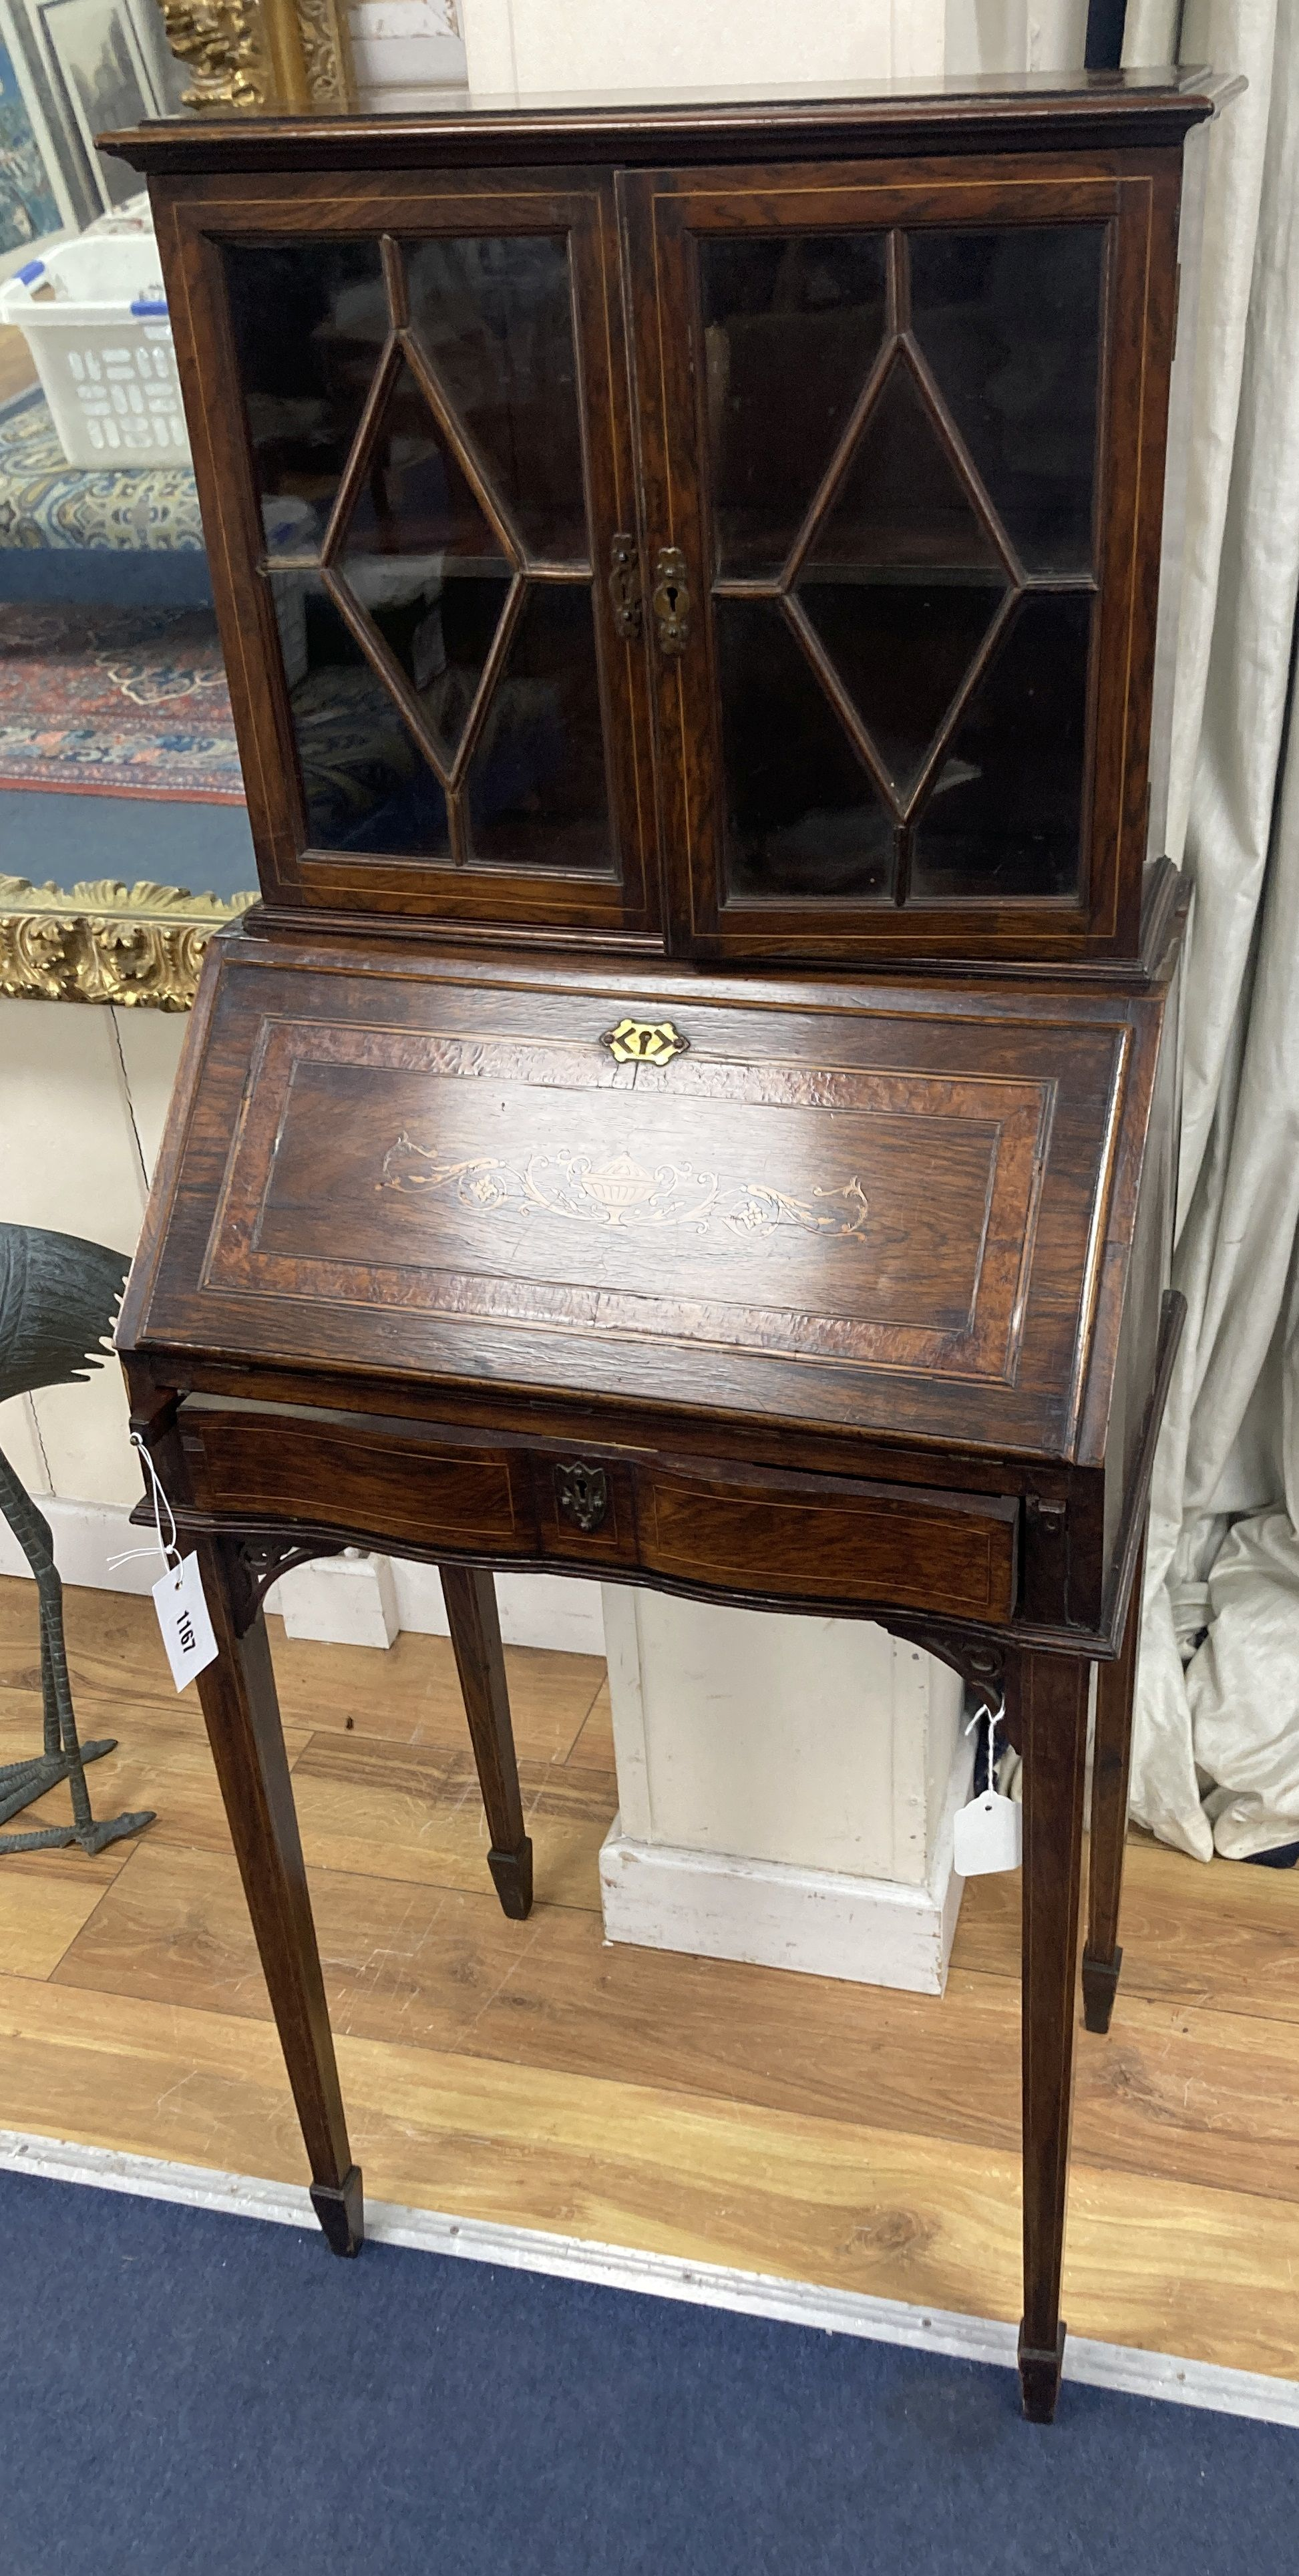 A late Victorian inlaid rosewood bonheur du jour, width 51cm, depth 34cm, height 129cm